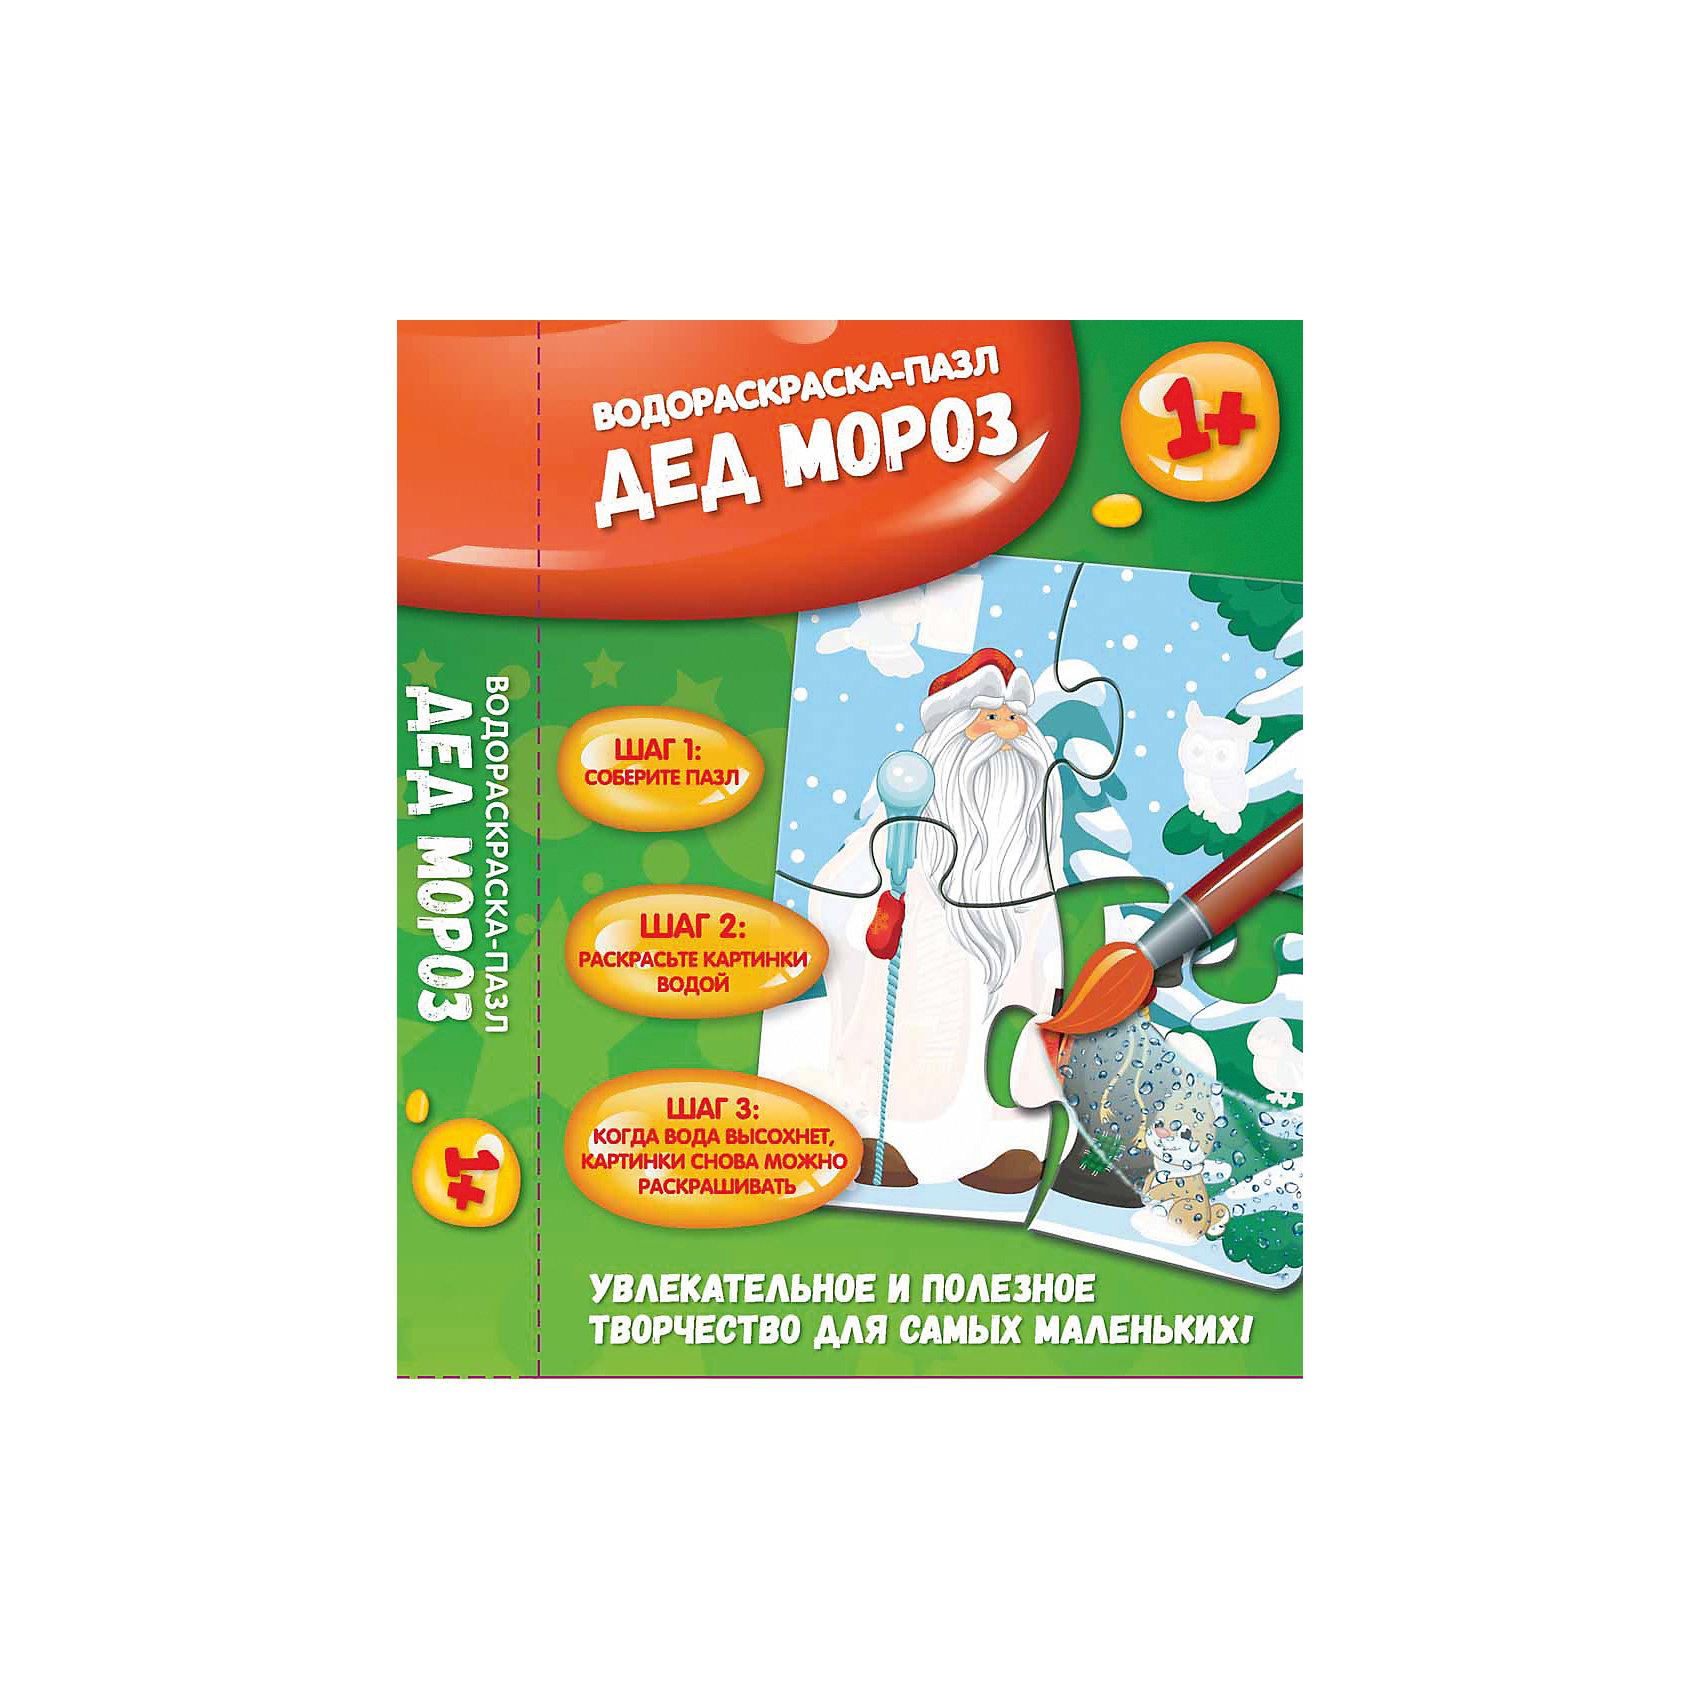 Дед Мороз: водораскраска-пазл